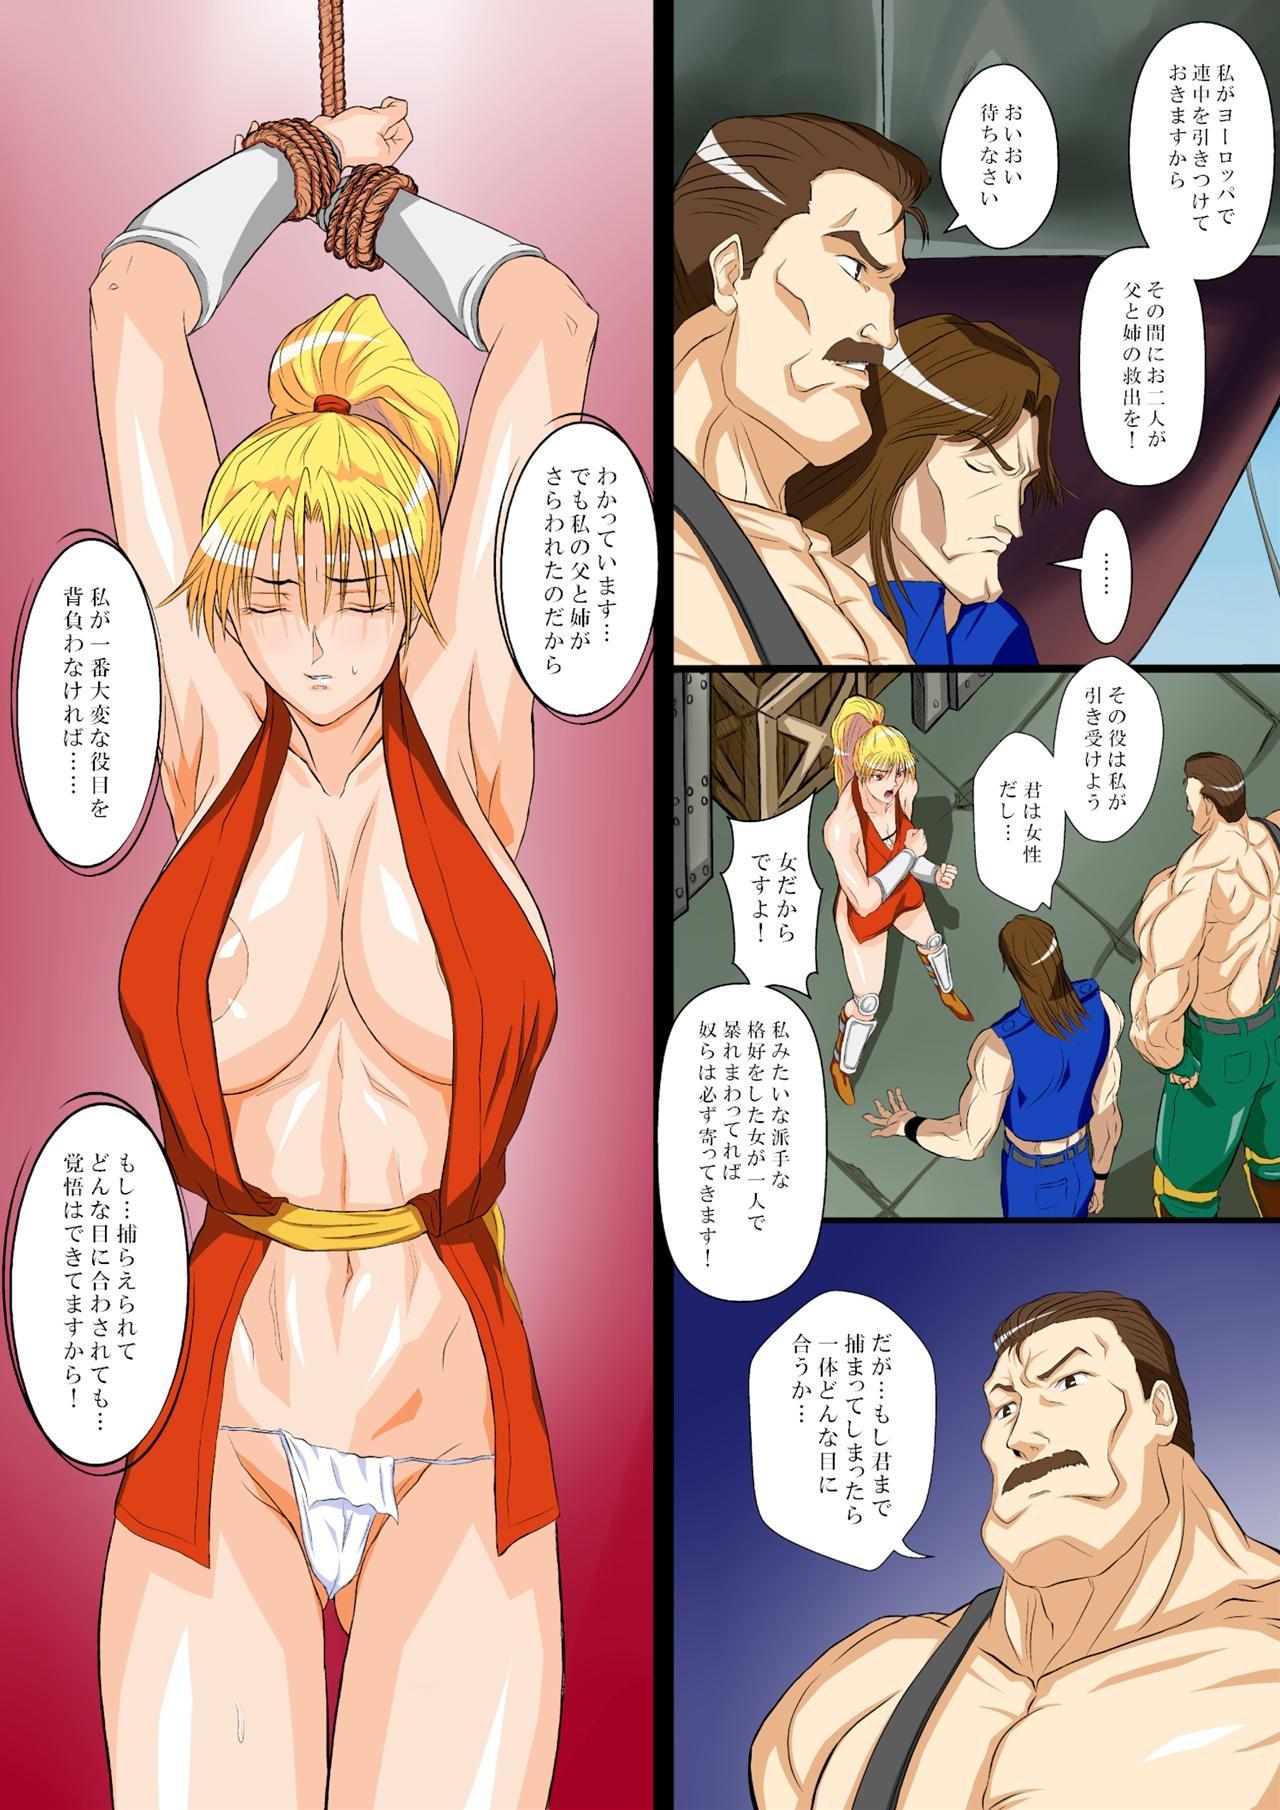 Maki's Stage 4 17